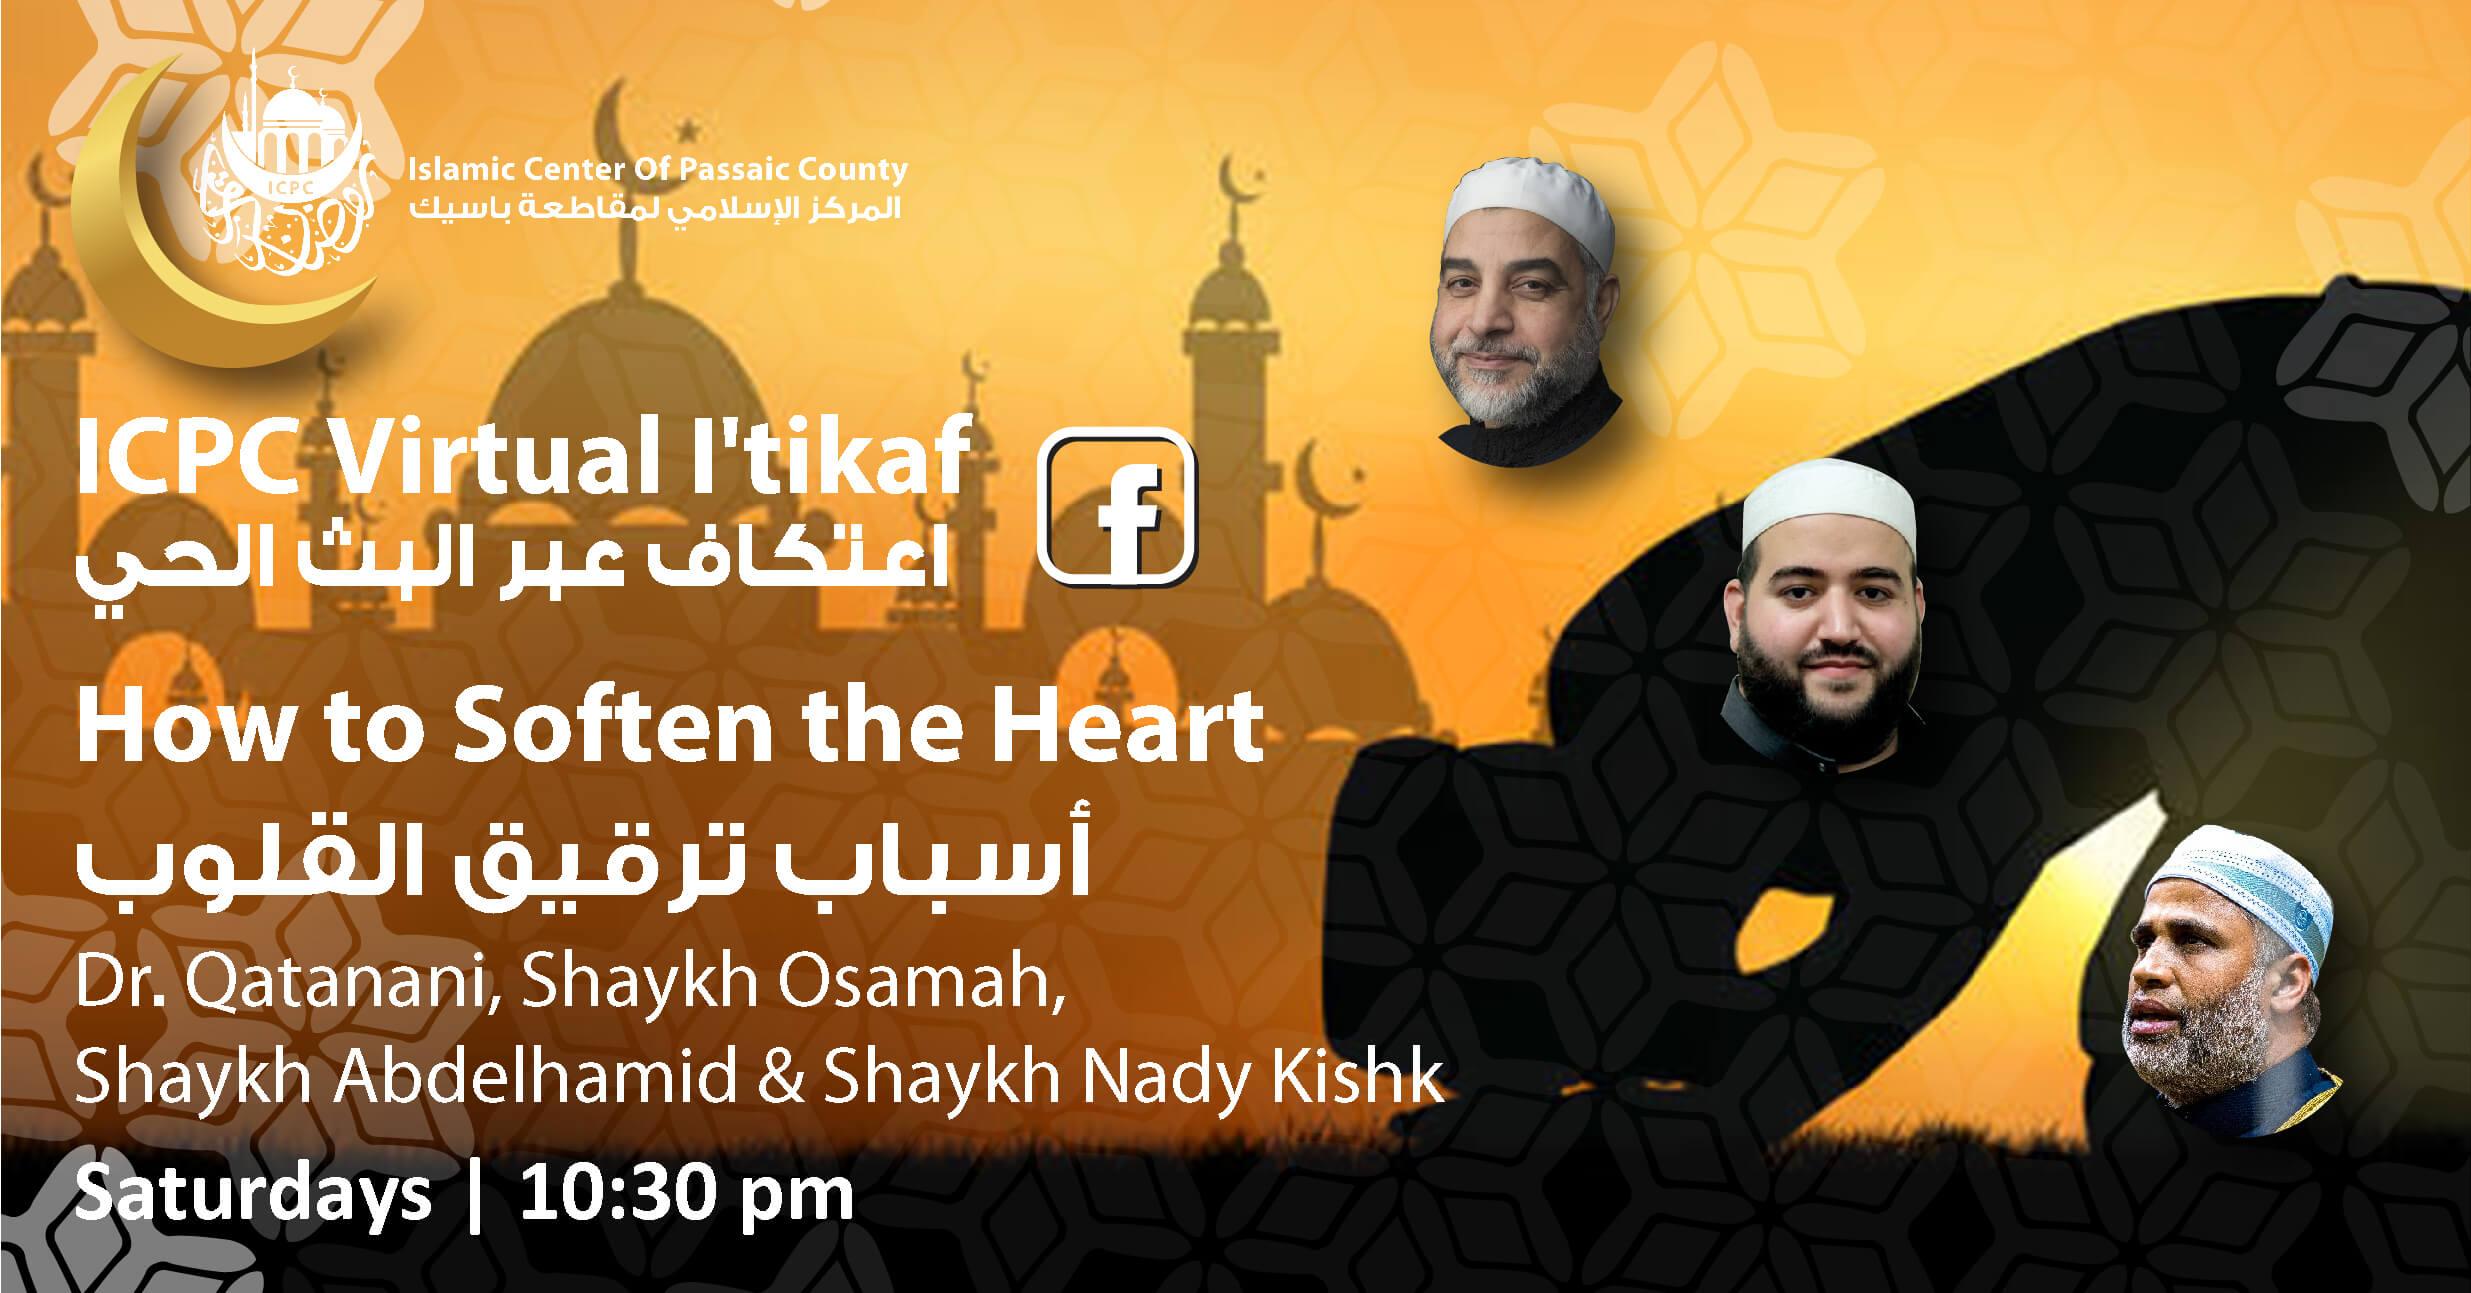 ramadan_itikaf_socialmediabanners-02